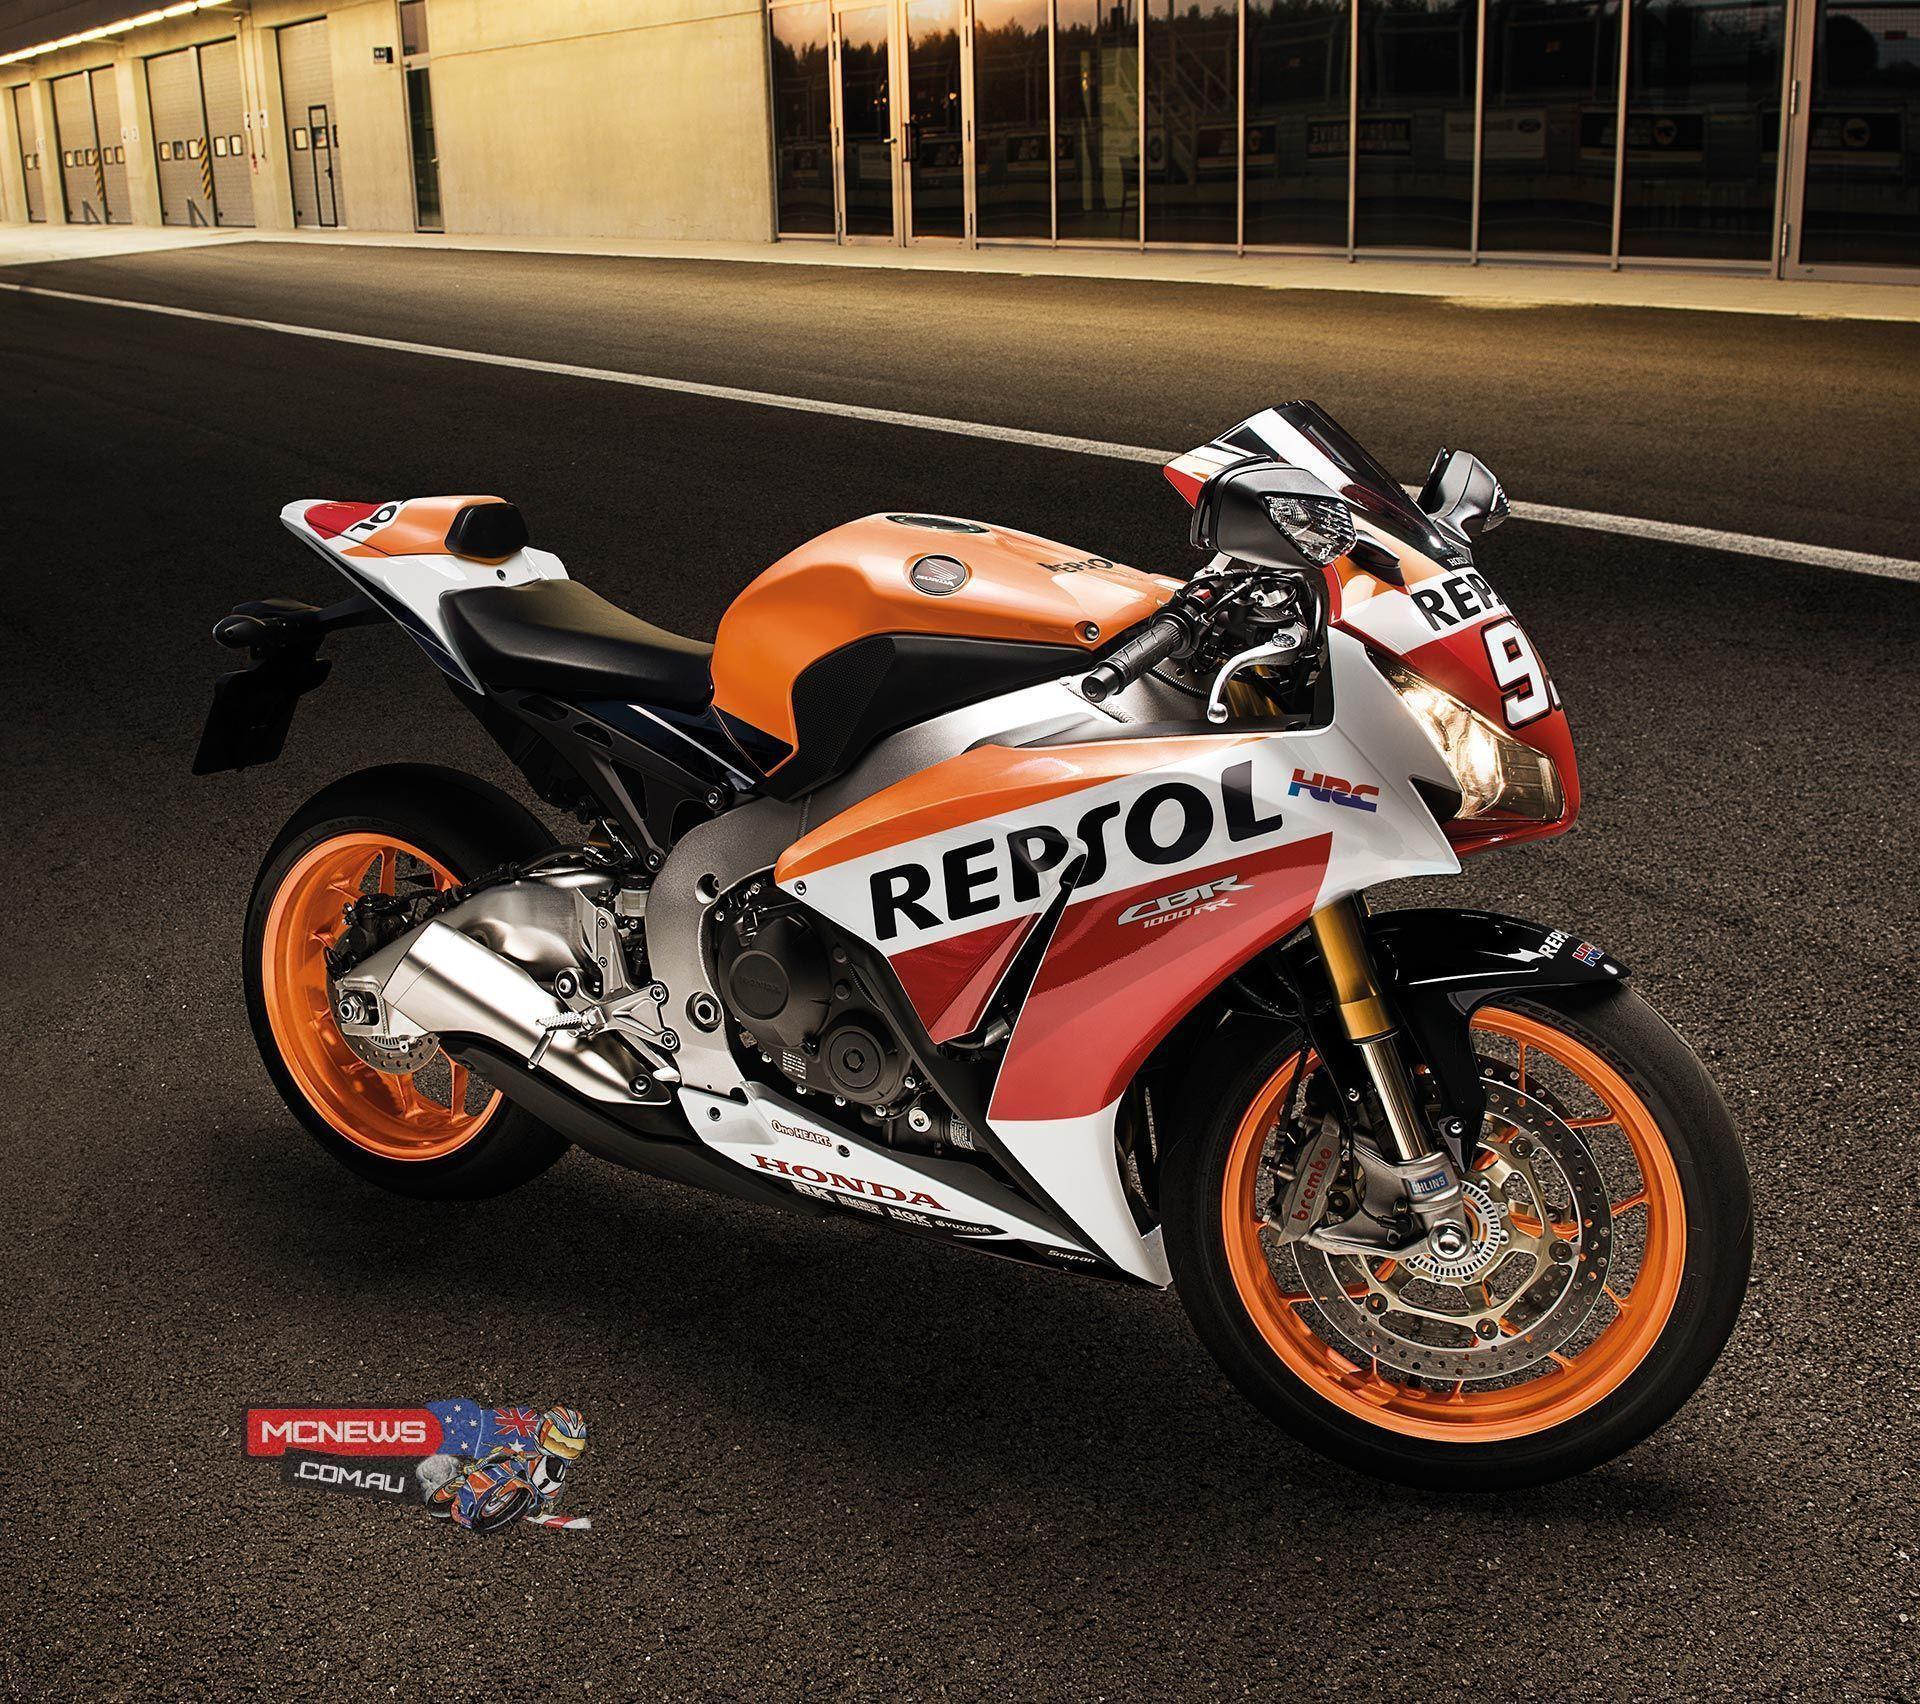 CBR1000RR Repsol 2015 HD Wallpapers